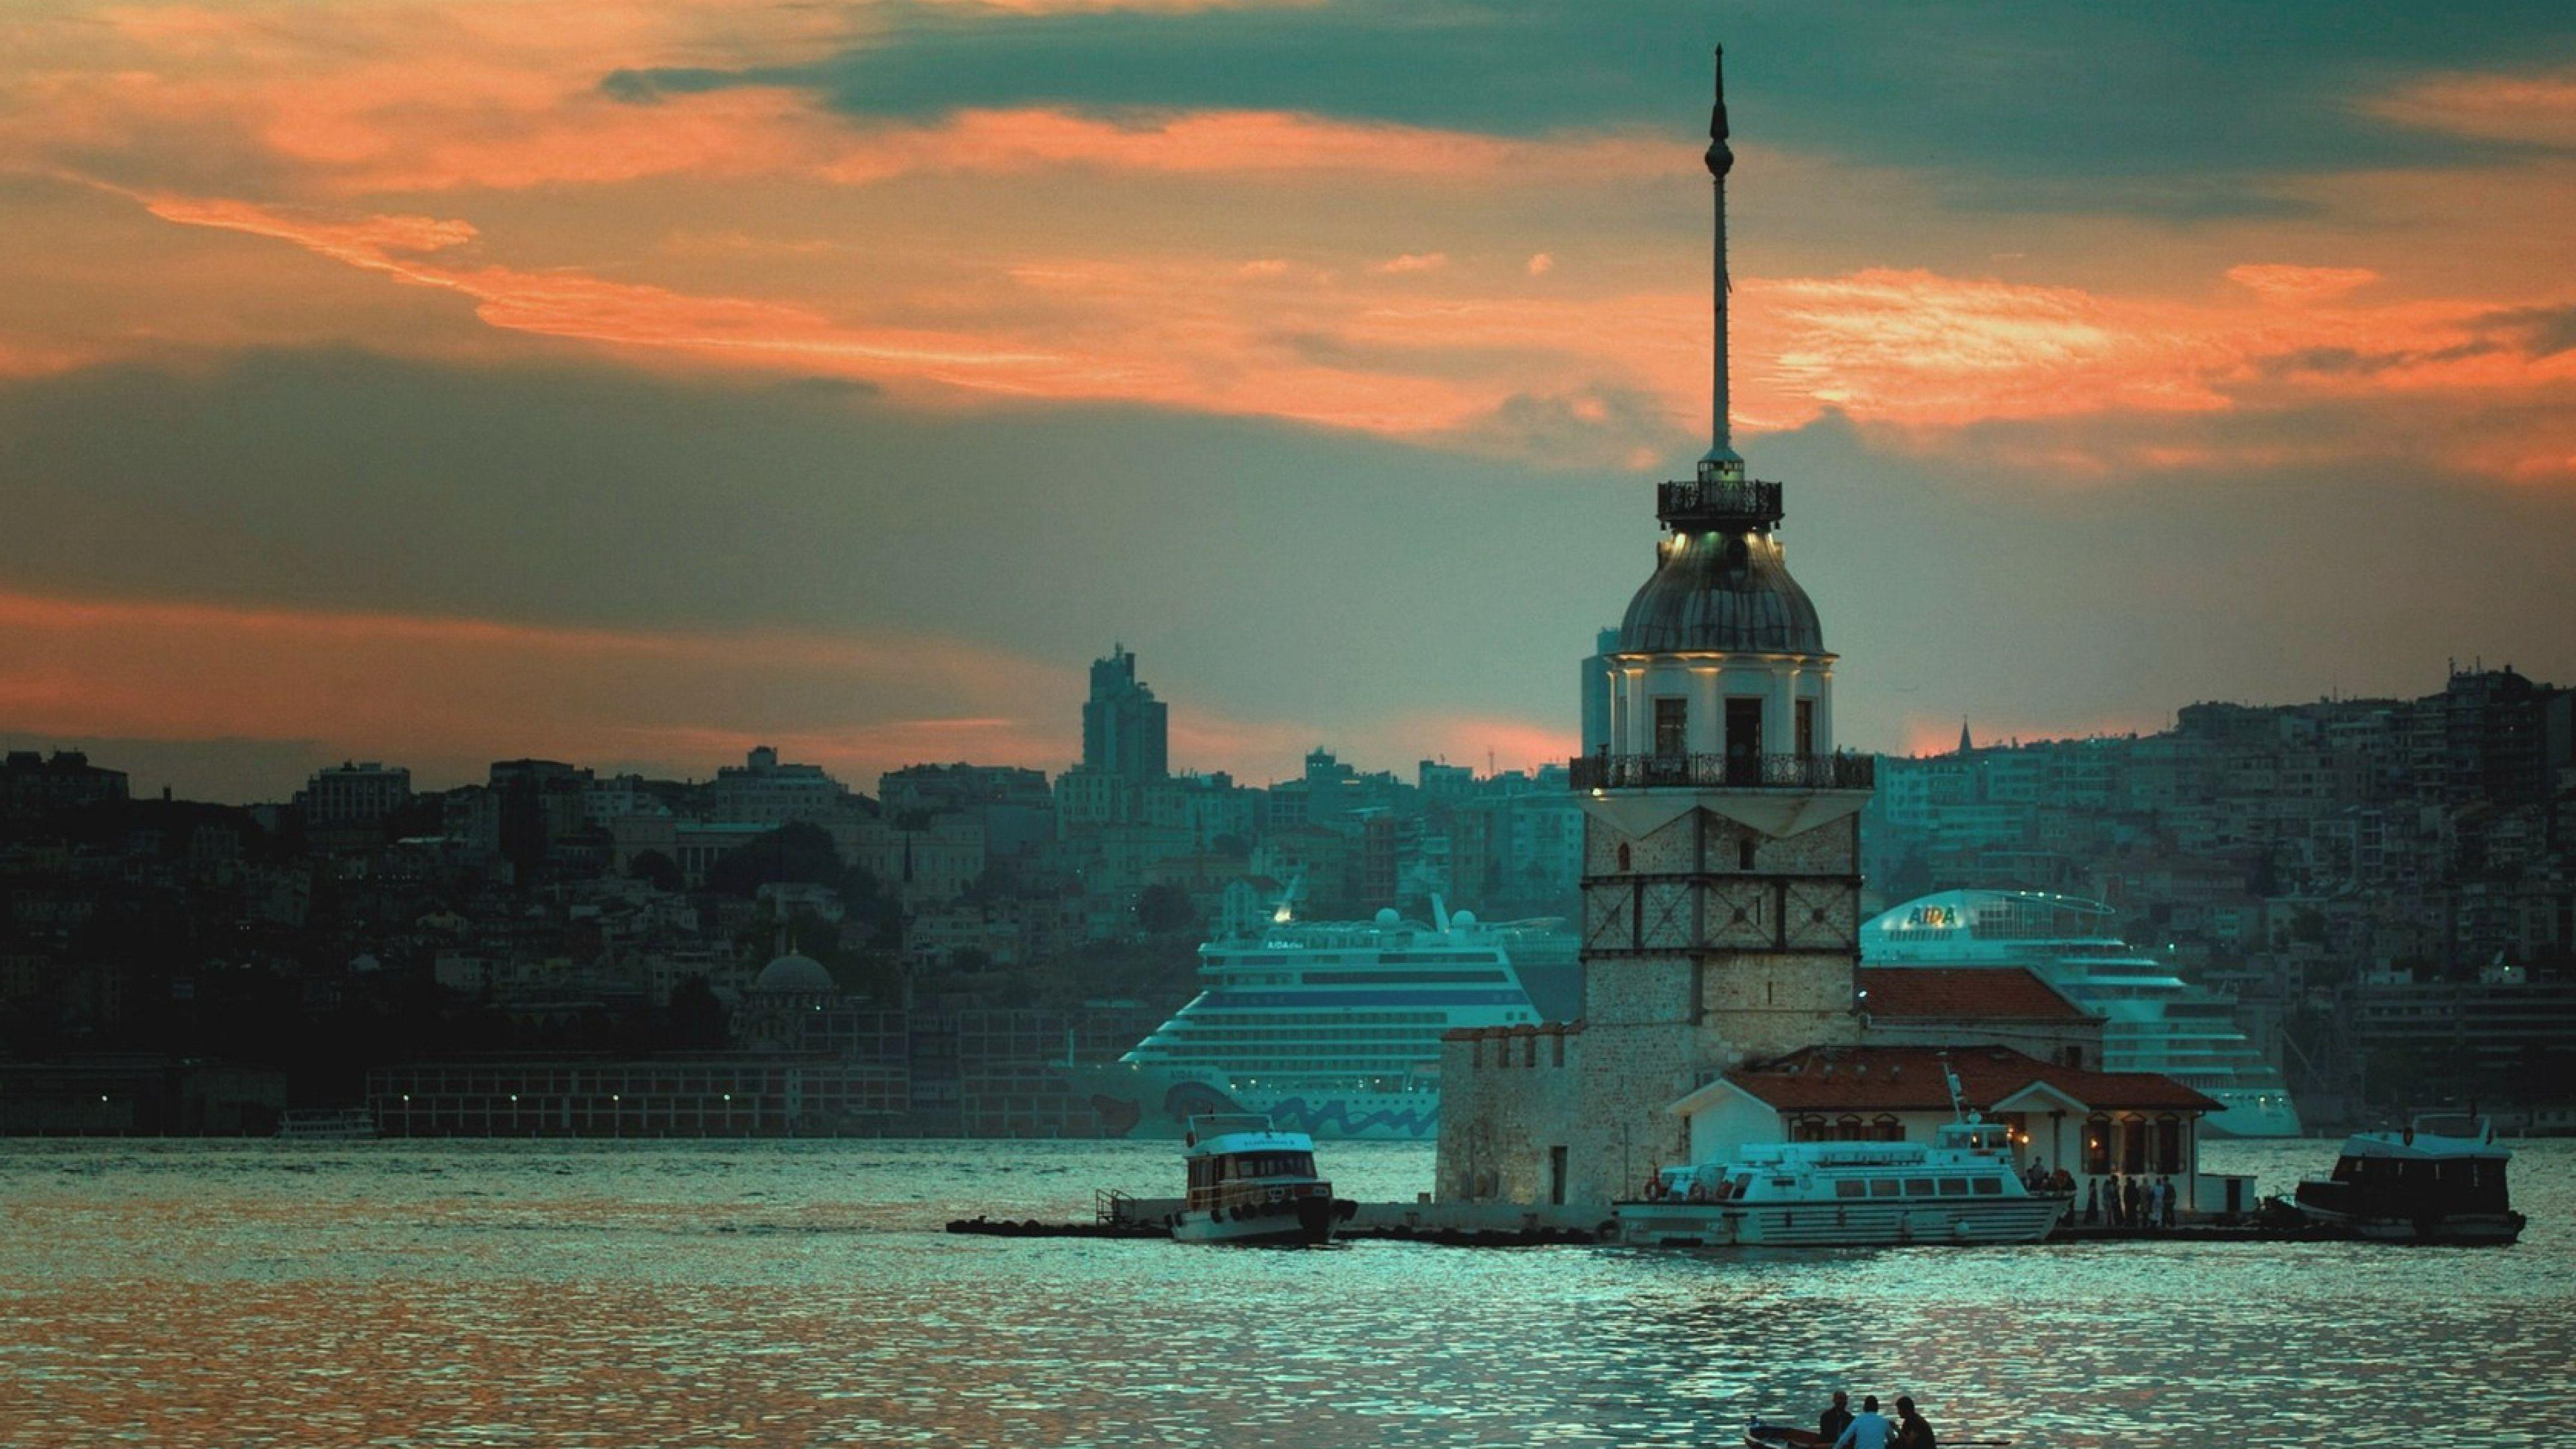 Istanbul wallpapers wallpaper cave - Desktop wallpaper 4k ultra hd ...